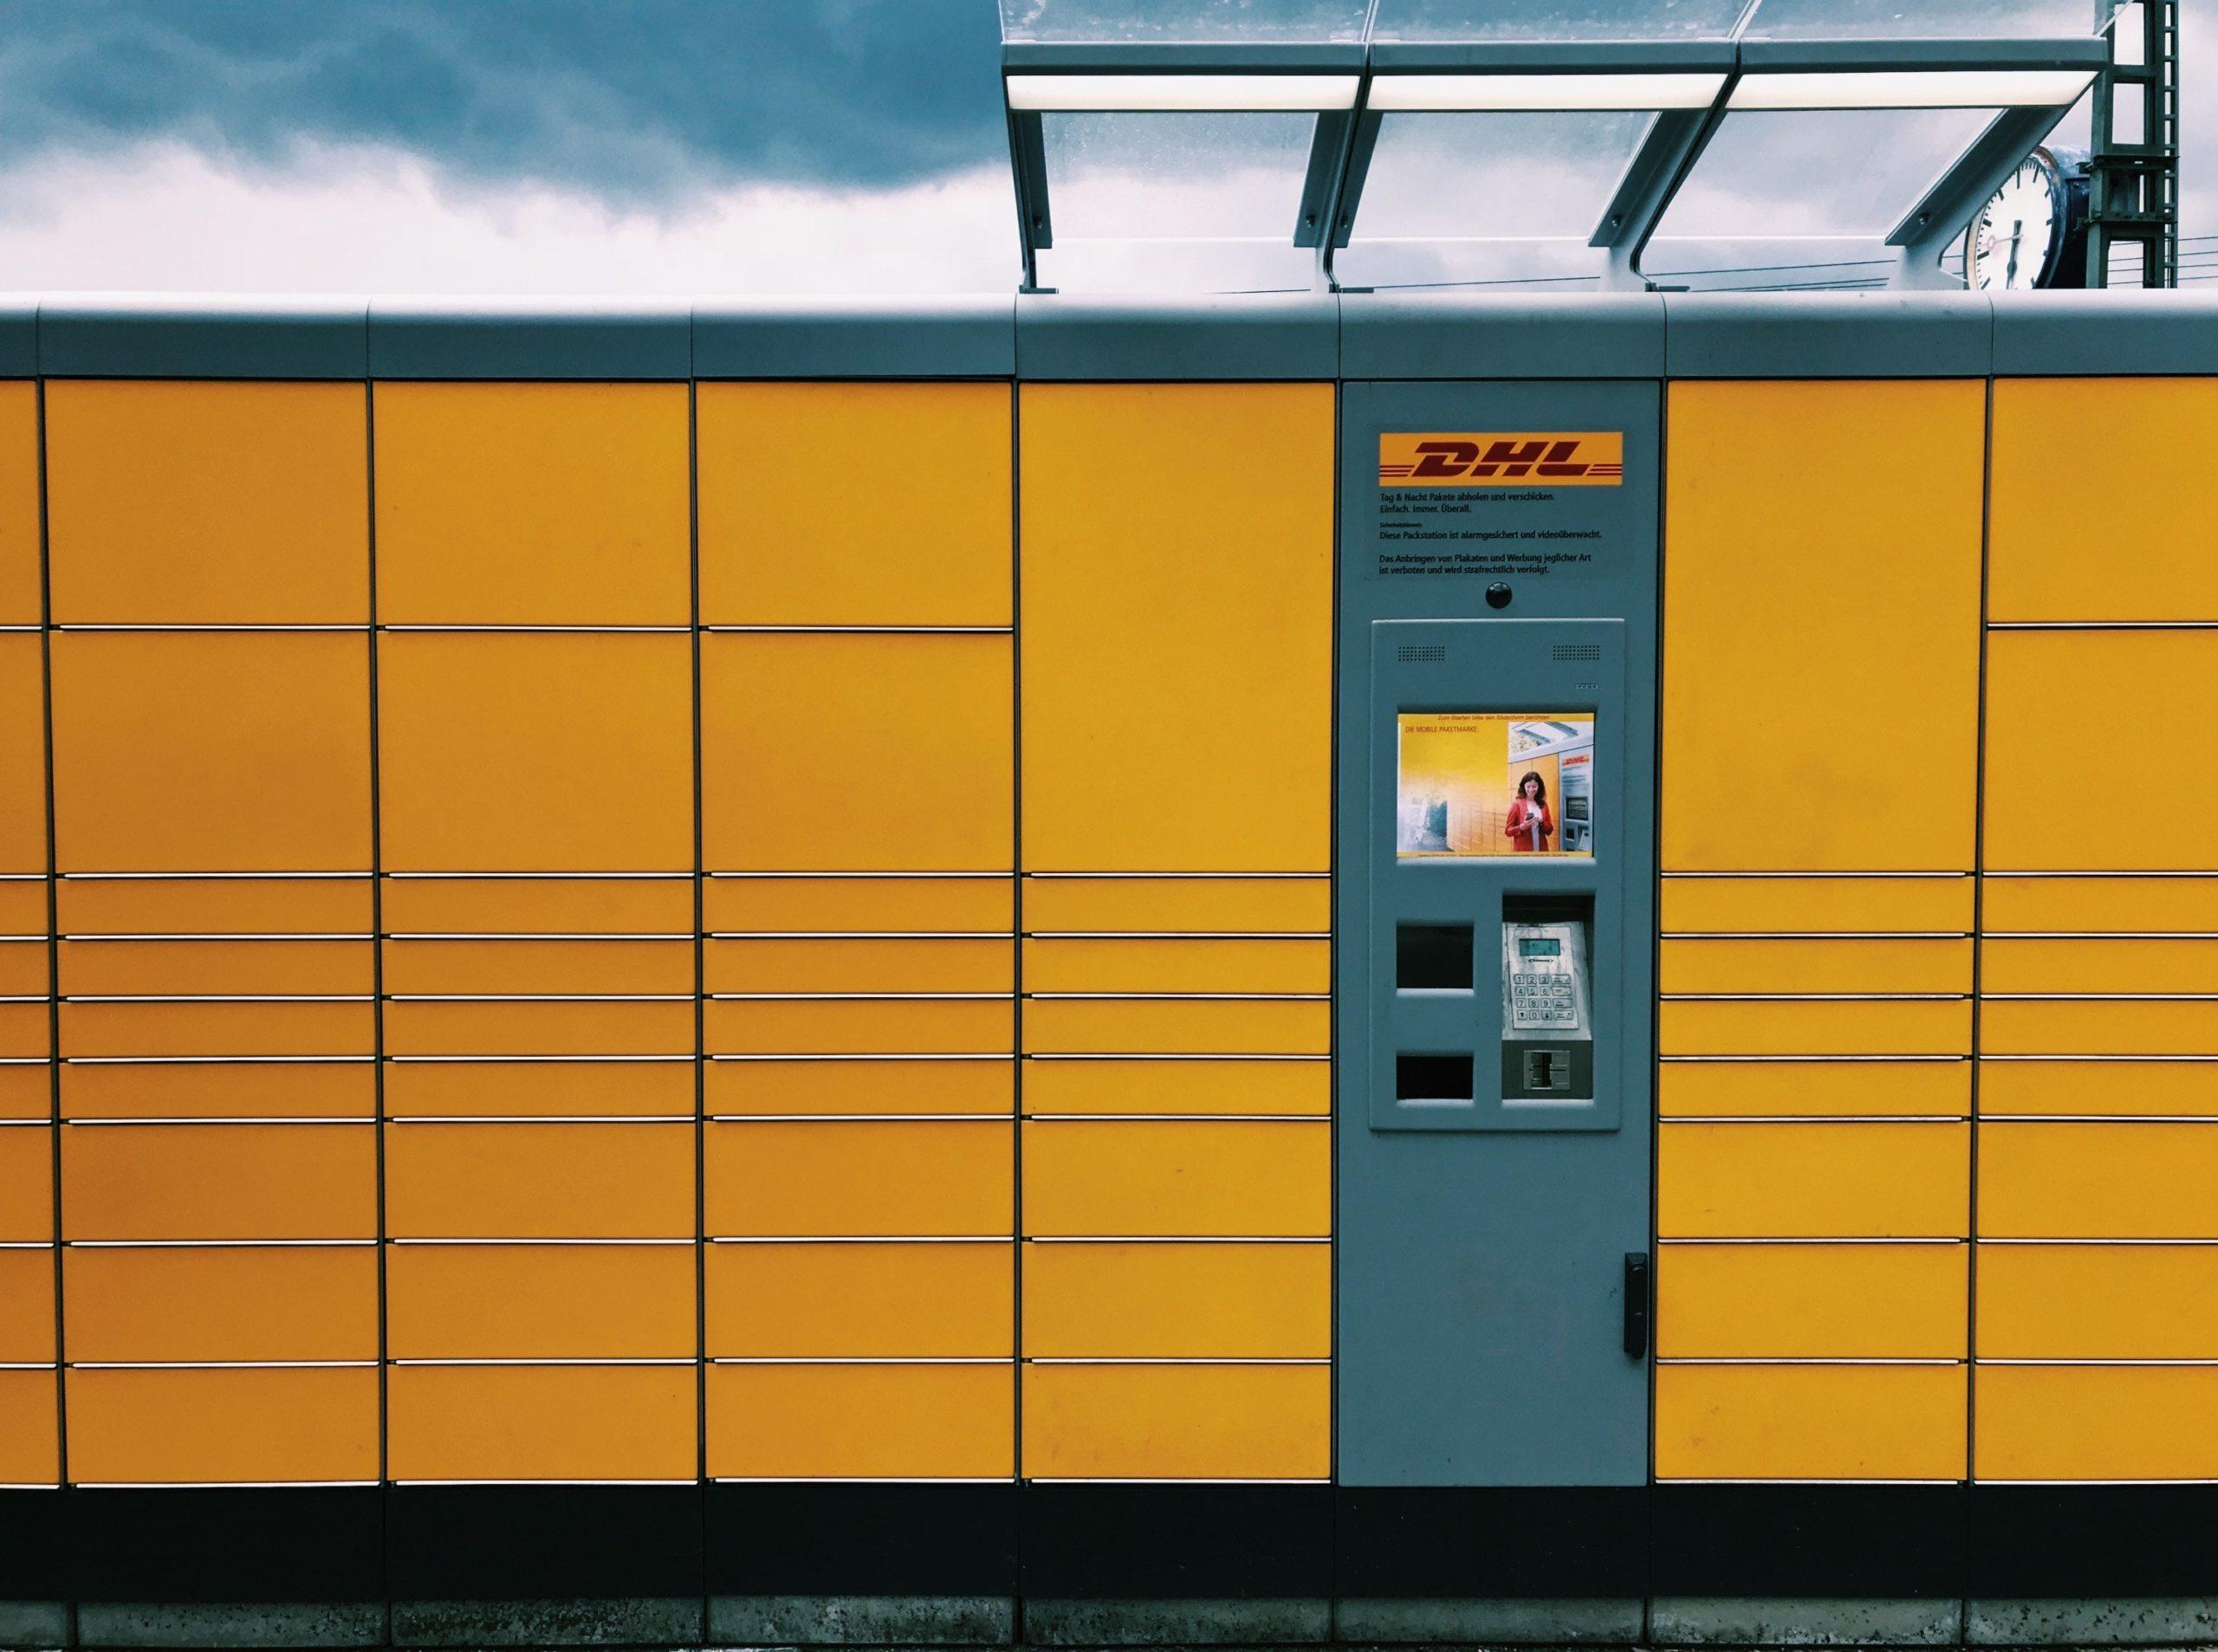 DHL parcel locker self-service kiosk.